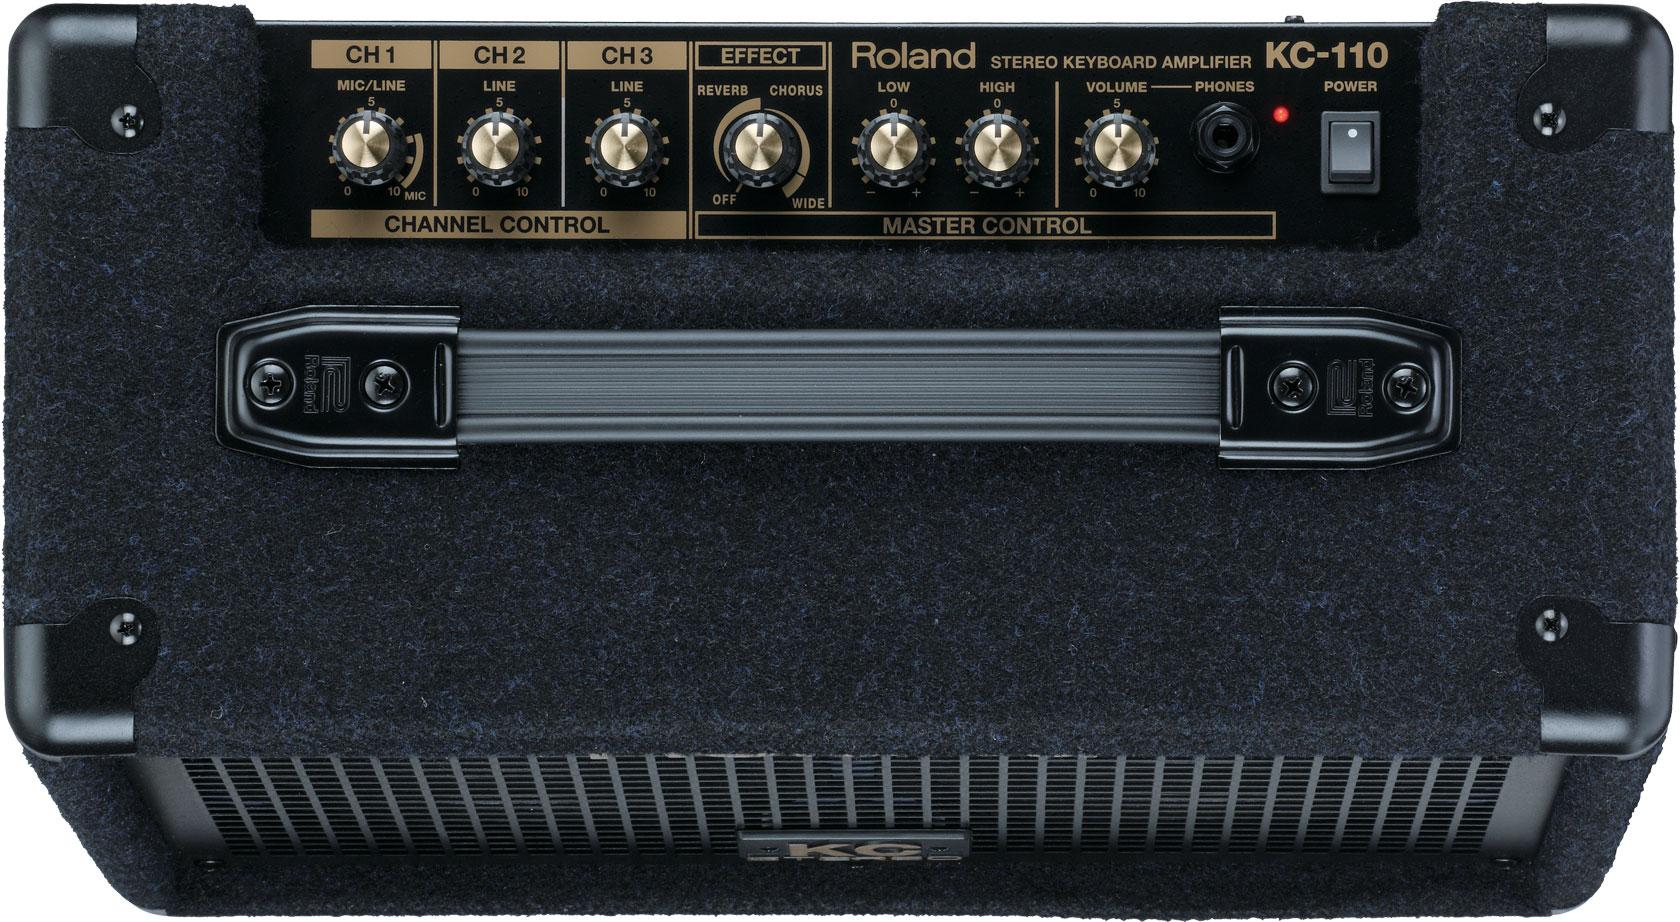 High Amp Battery >> Roland - KC-110 | Stereo Keyboard Amplifier